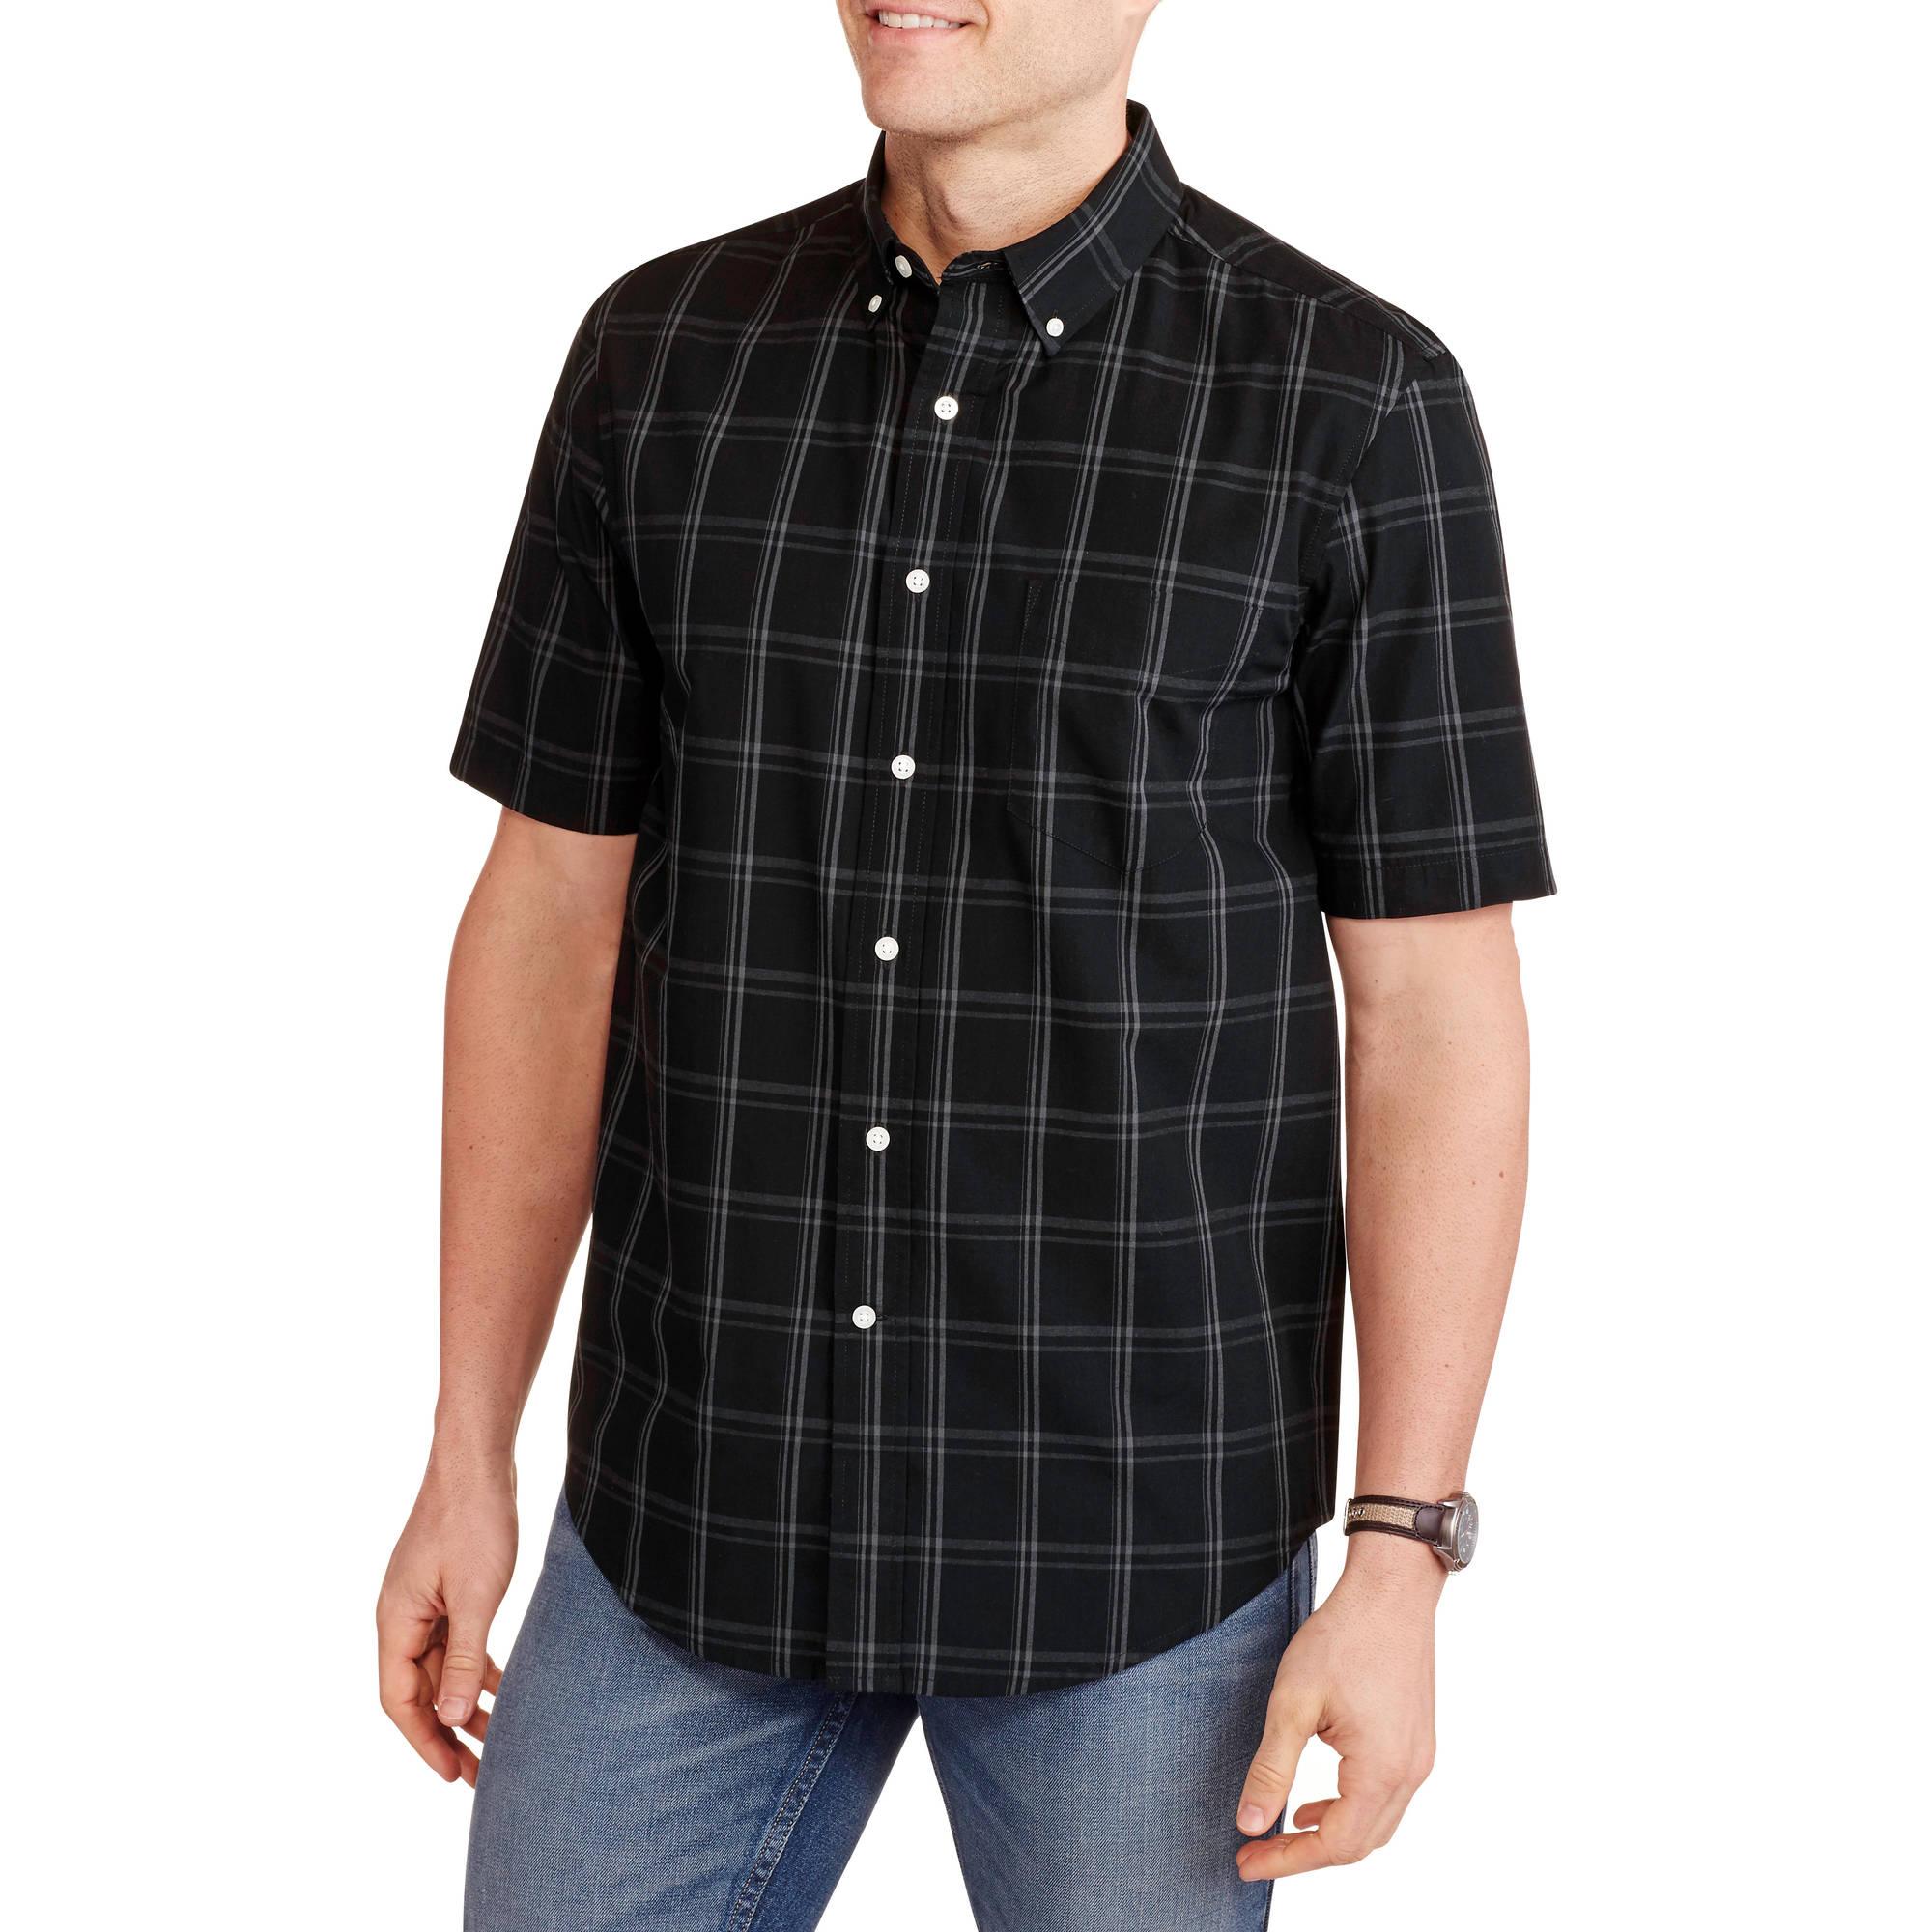 George Men's Short Sleeve Plaid Woven Shirt